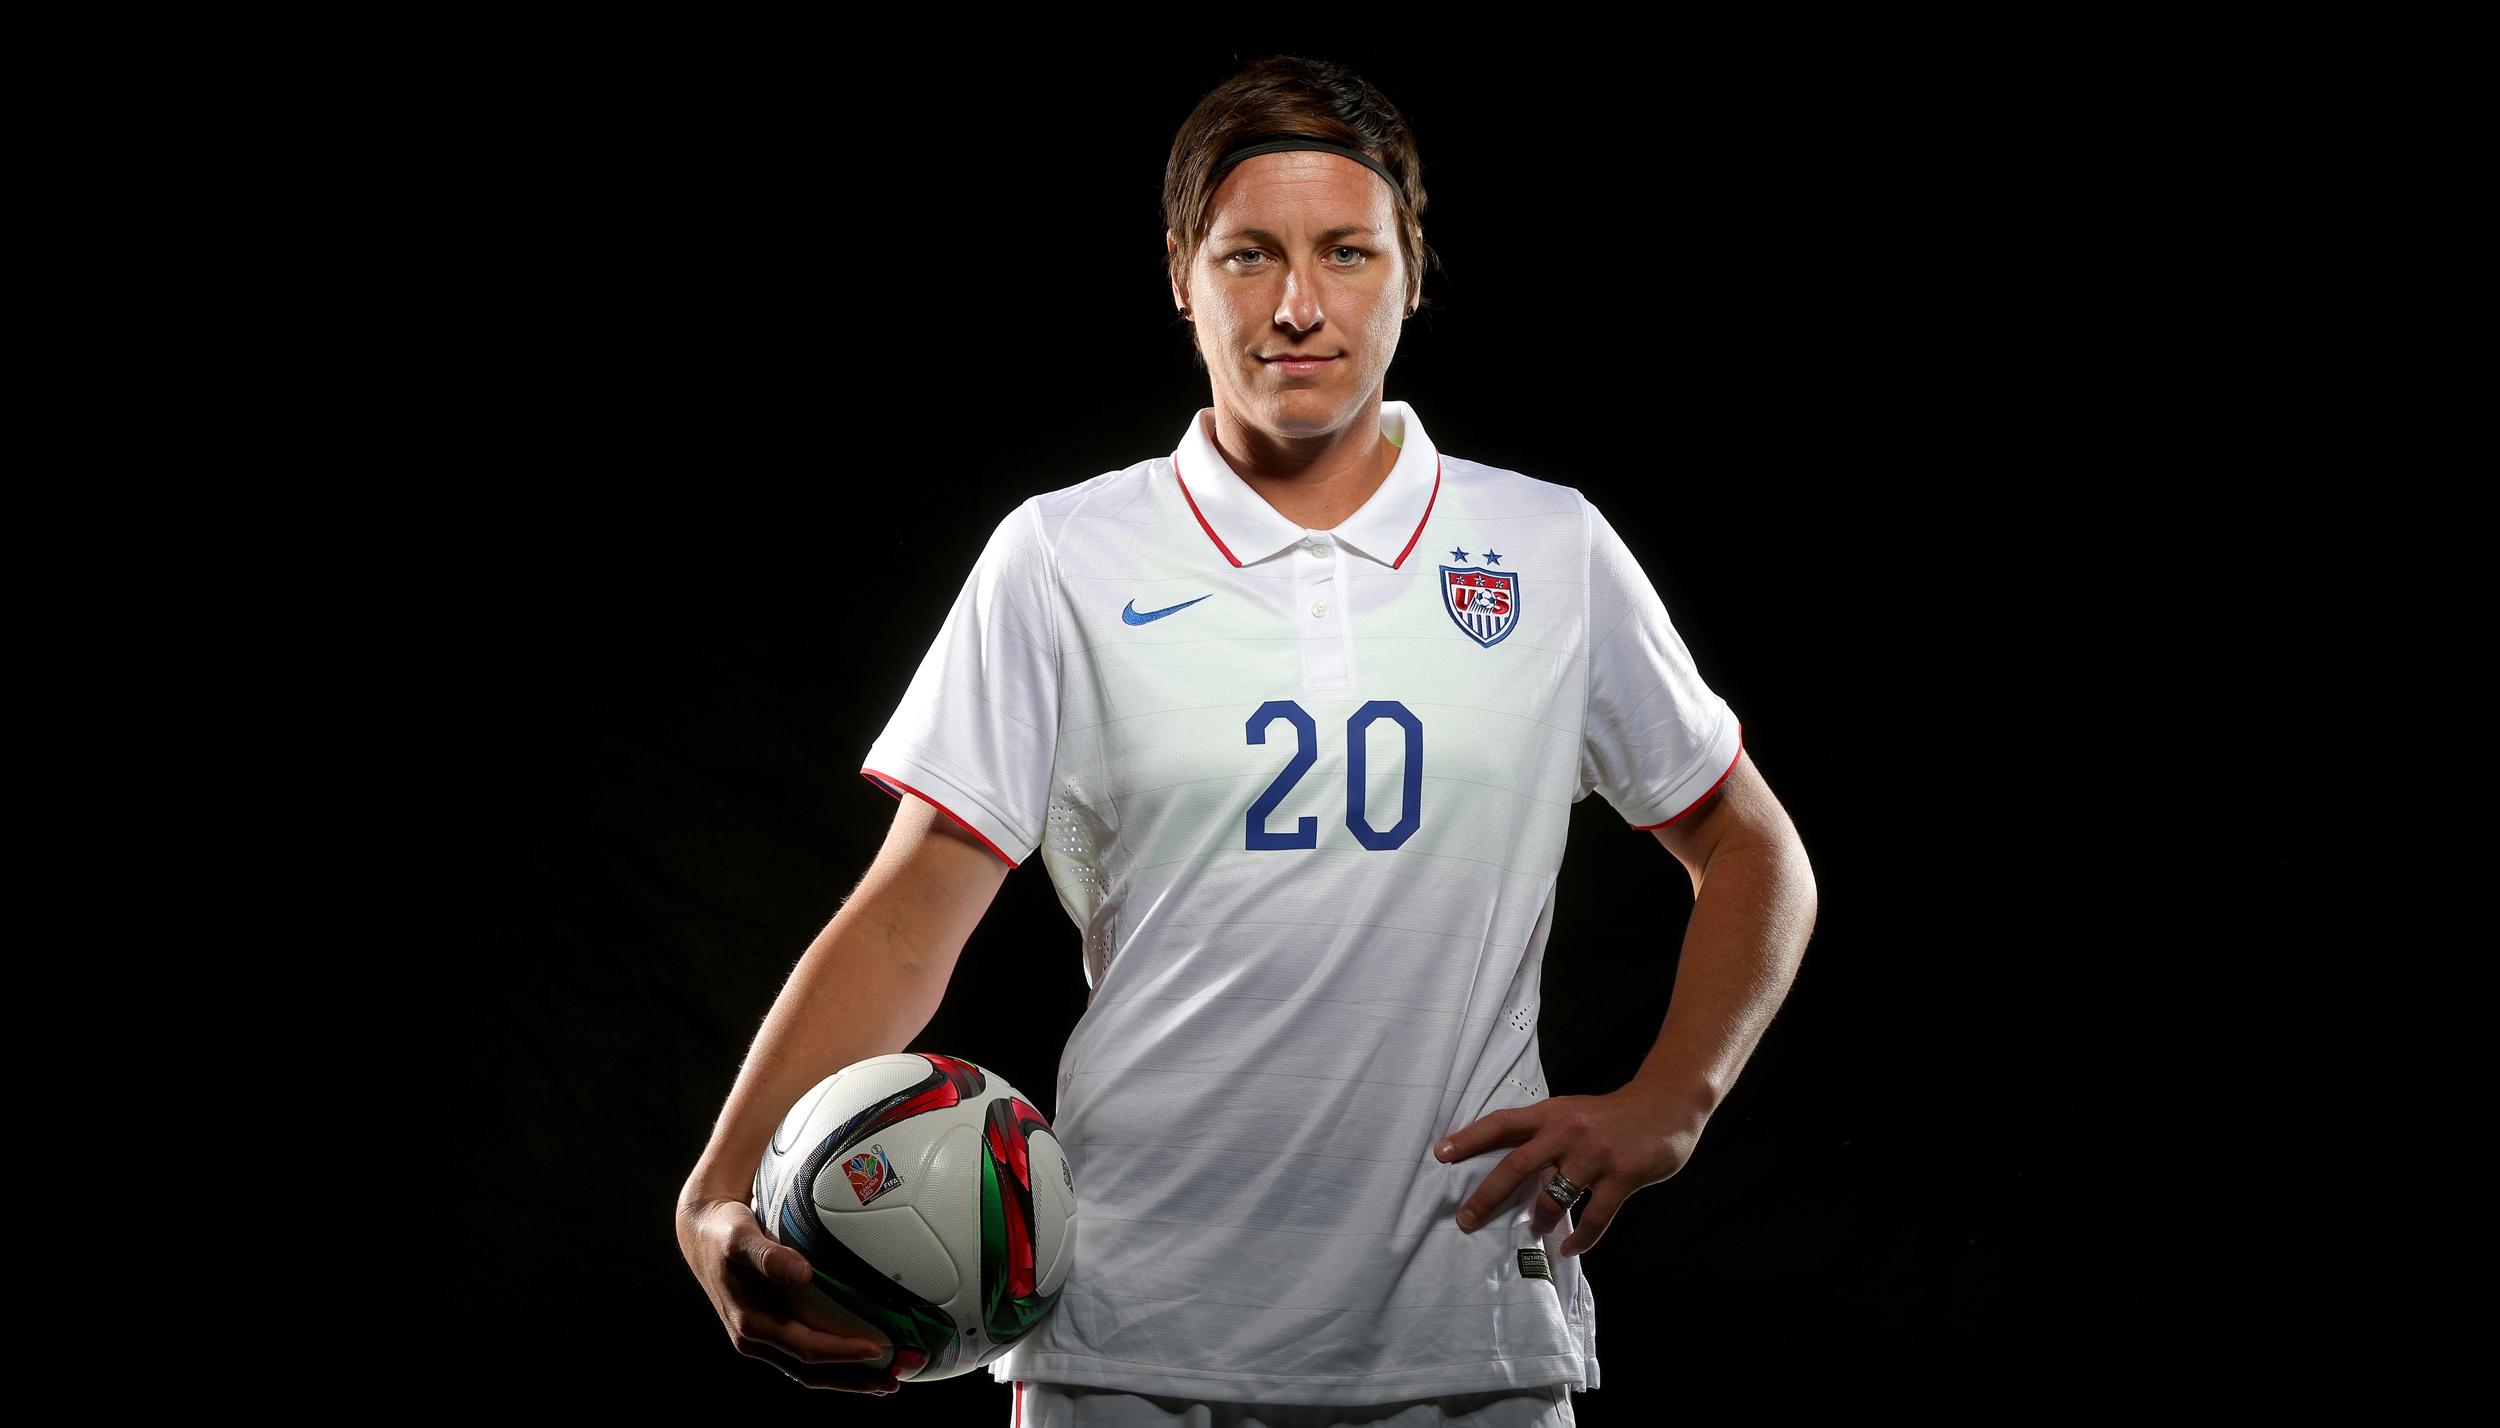 b64a7dcd625 Abby Wambach s Big Goals  Win the World Cup